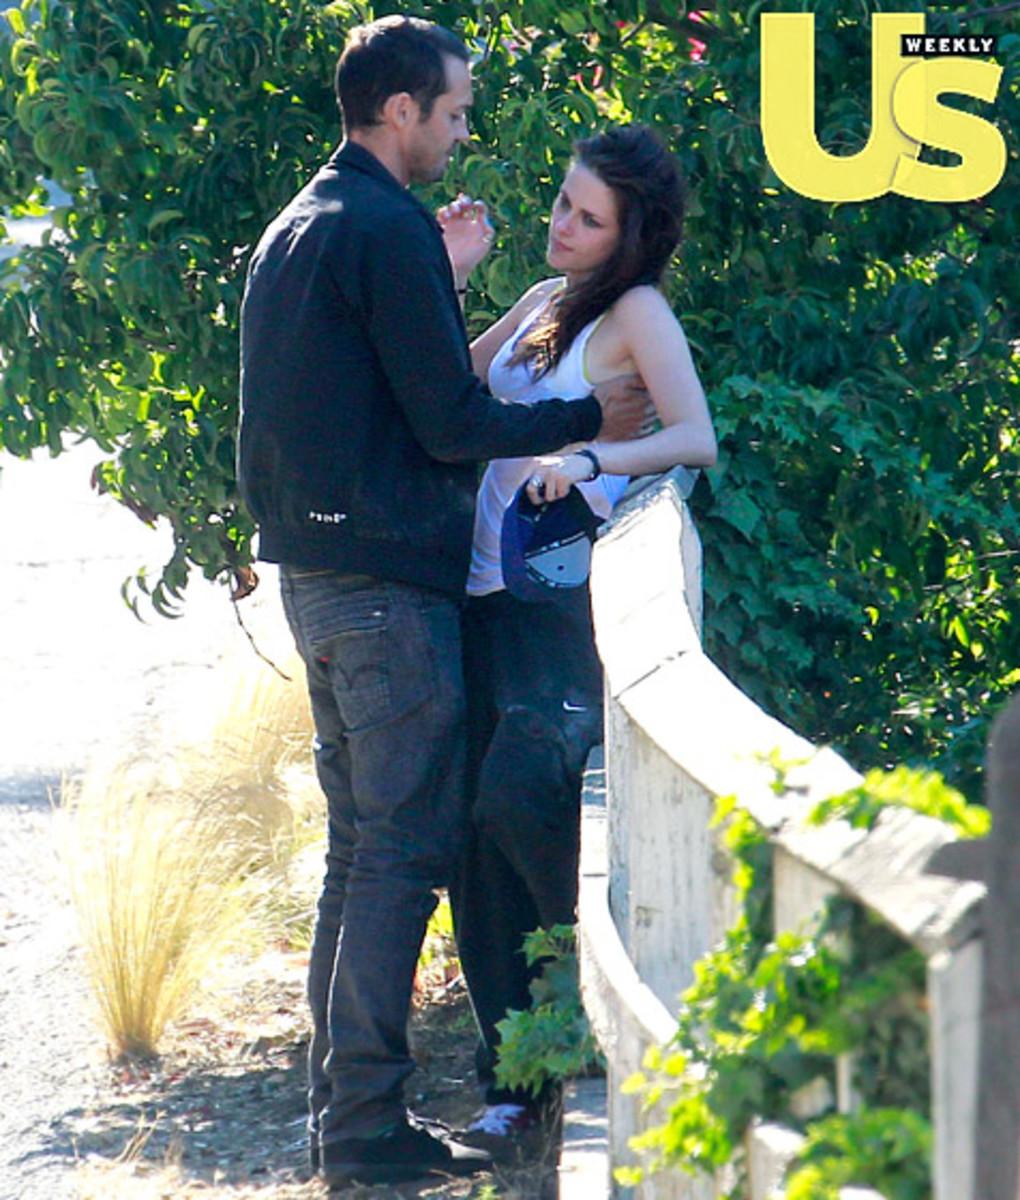 Kristen does not look like she is appreciating Rupert's advances.